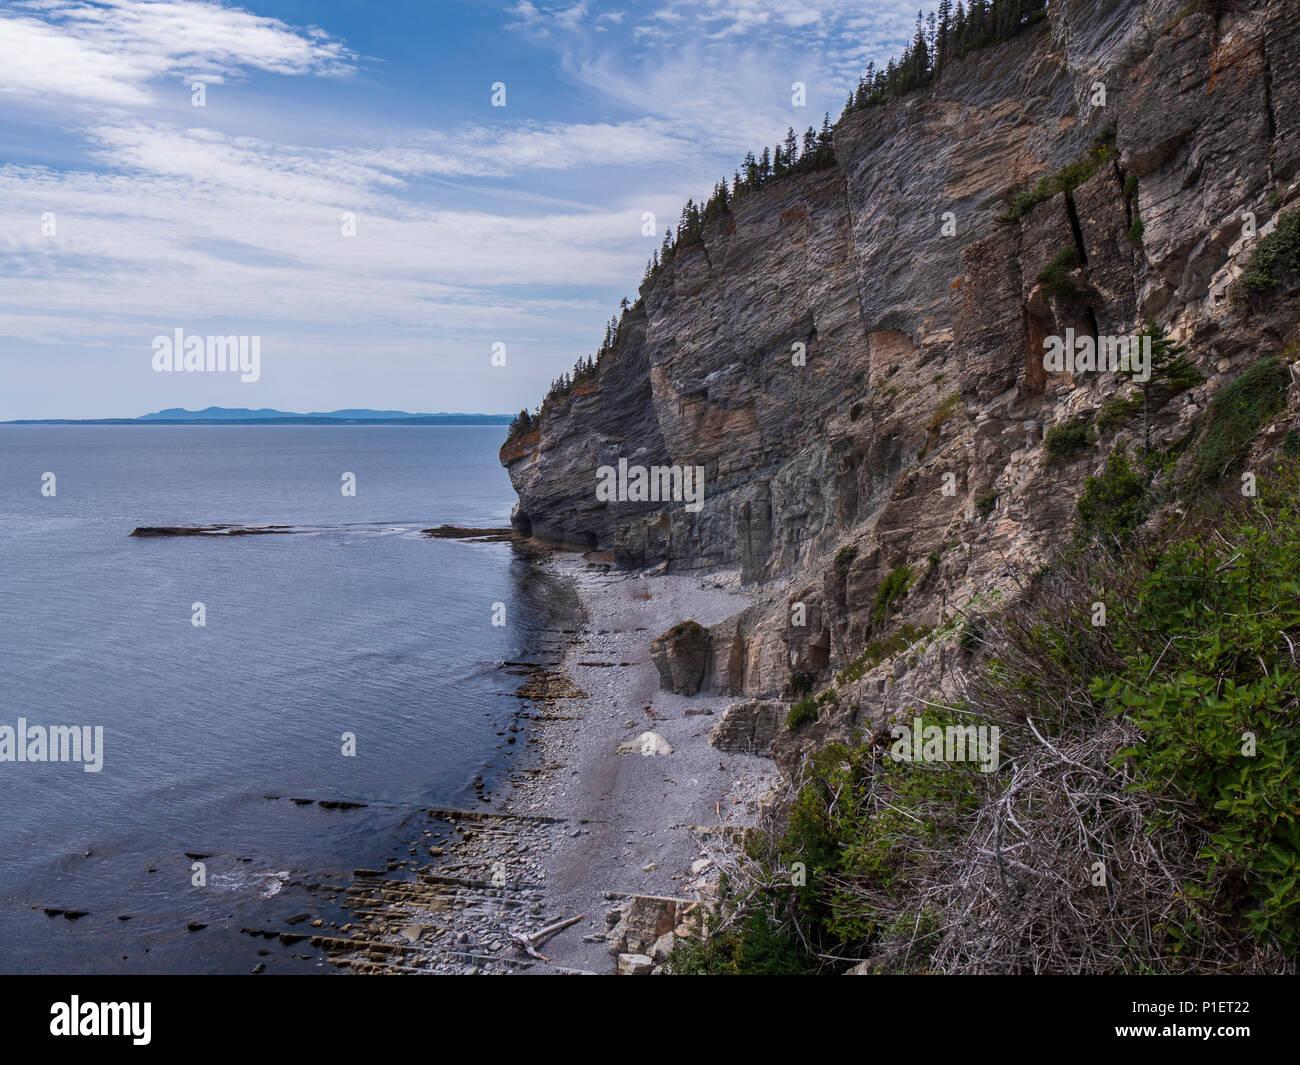 Cliffs at Land's End, Cap-Gaspe, Forillon National Park, Gaspe Peninsula, Canada. - Stock Image